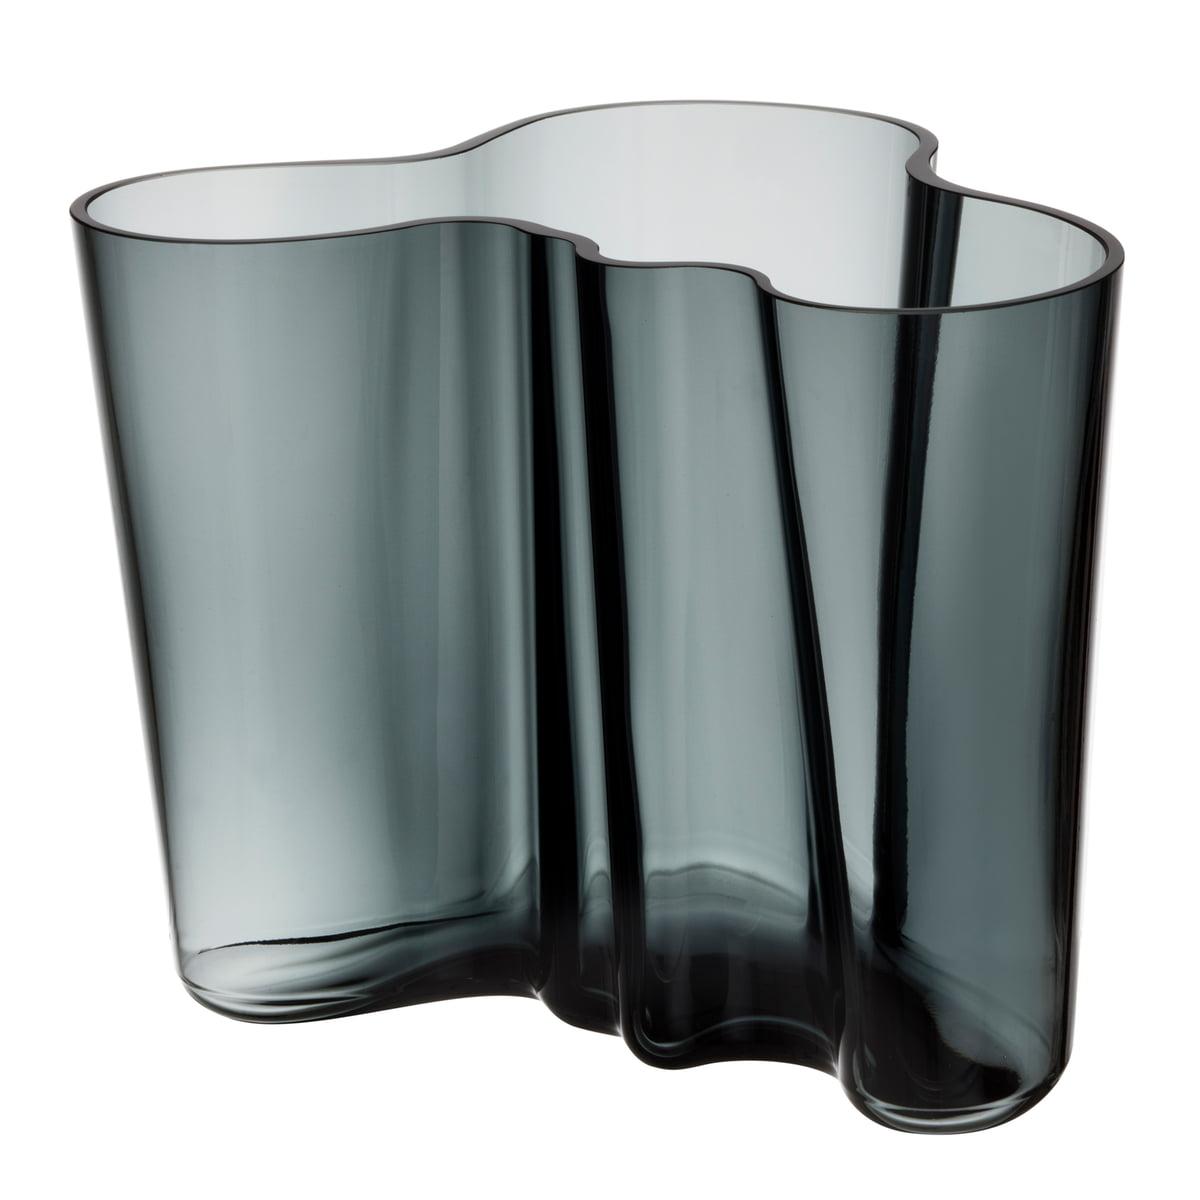 Iittala - Aalto Vase Savoy 160 mm, dunkelgrau | Dekoration > Vasen | Dunkelgrau | Iittala